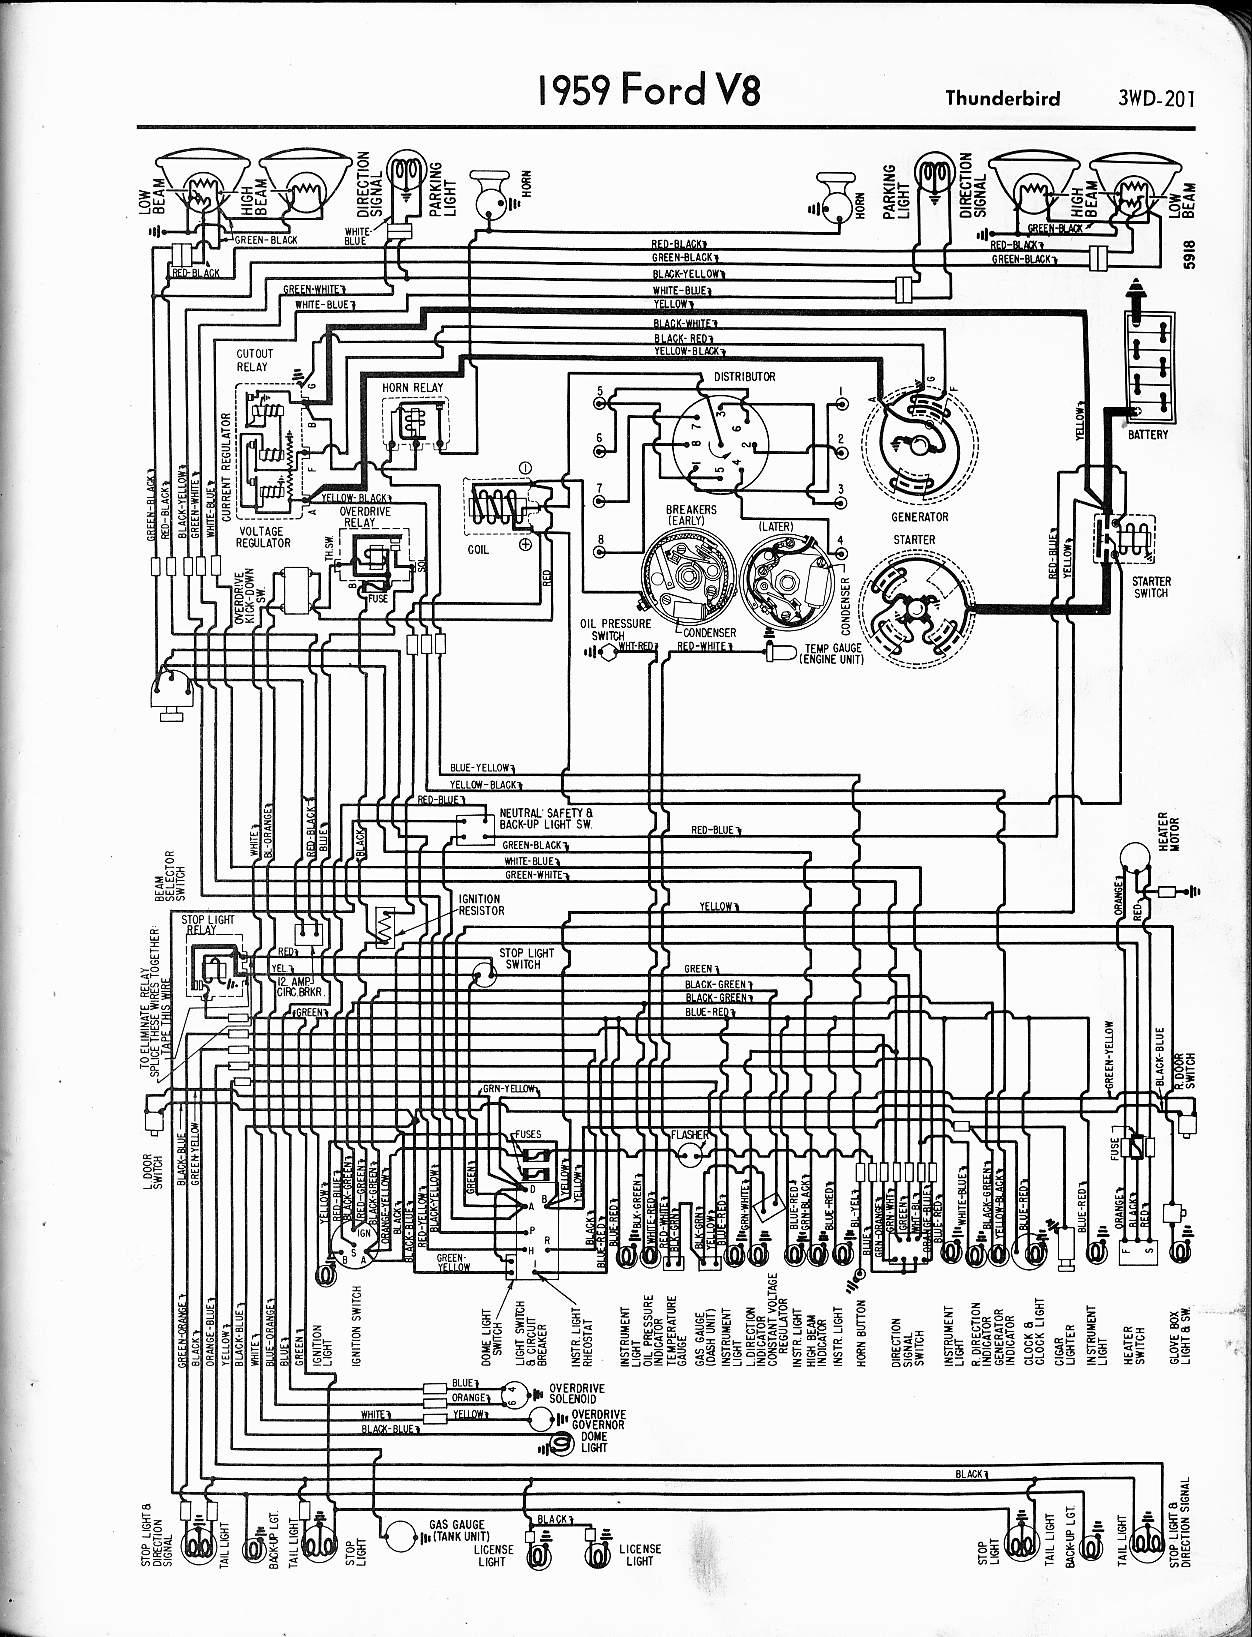 Patlite Wiring Diagram Lelw Schematic Diagrams Lme 02l Model Met Manual Iskra Terminal 2 Exelent Tp